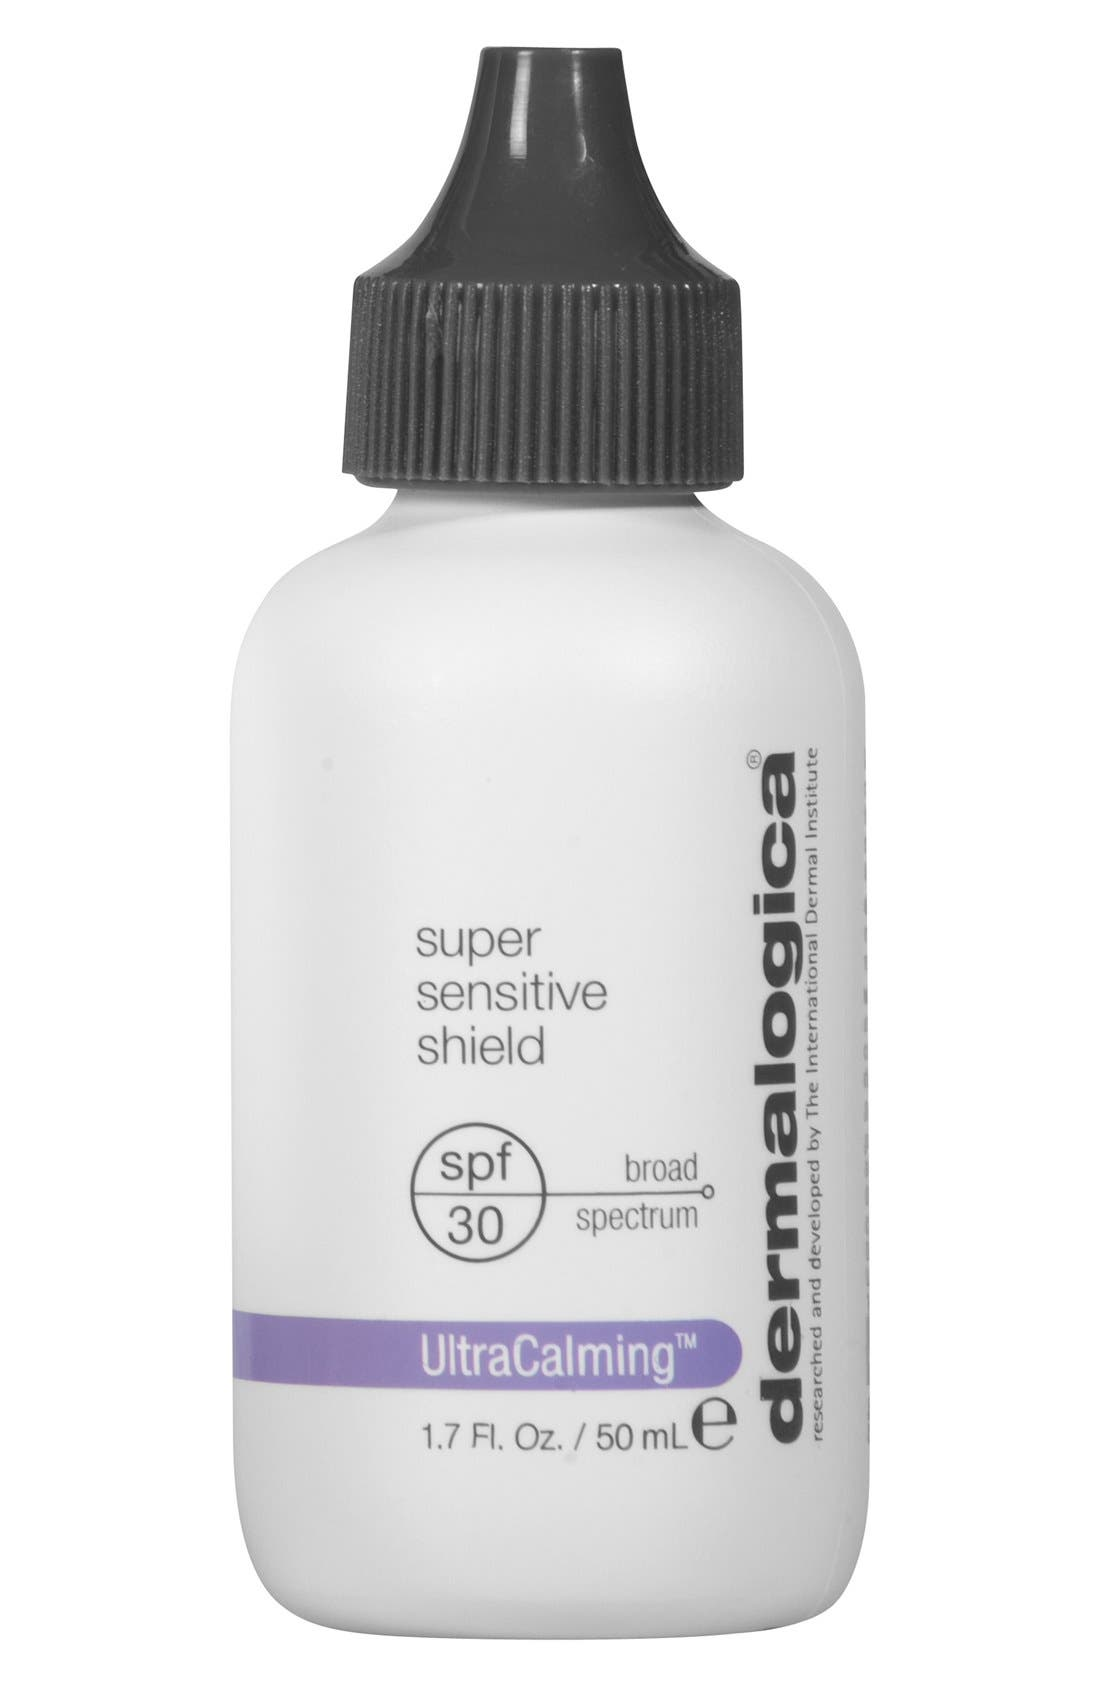 Dermalogica Super Sensitive Shield Spf 30 Sunscreen